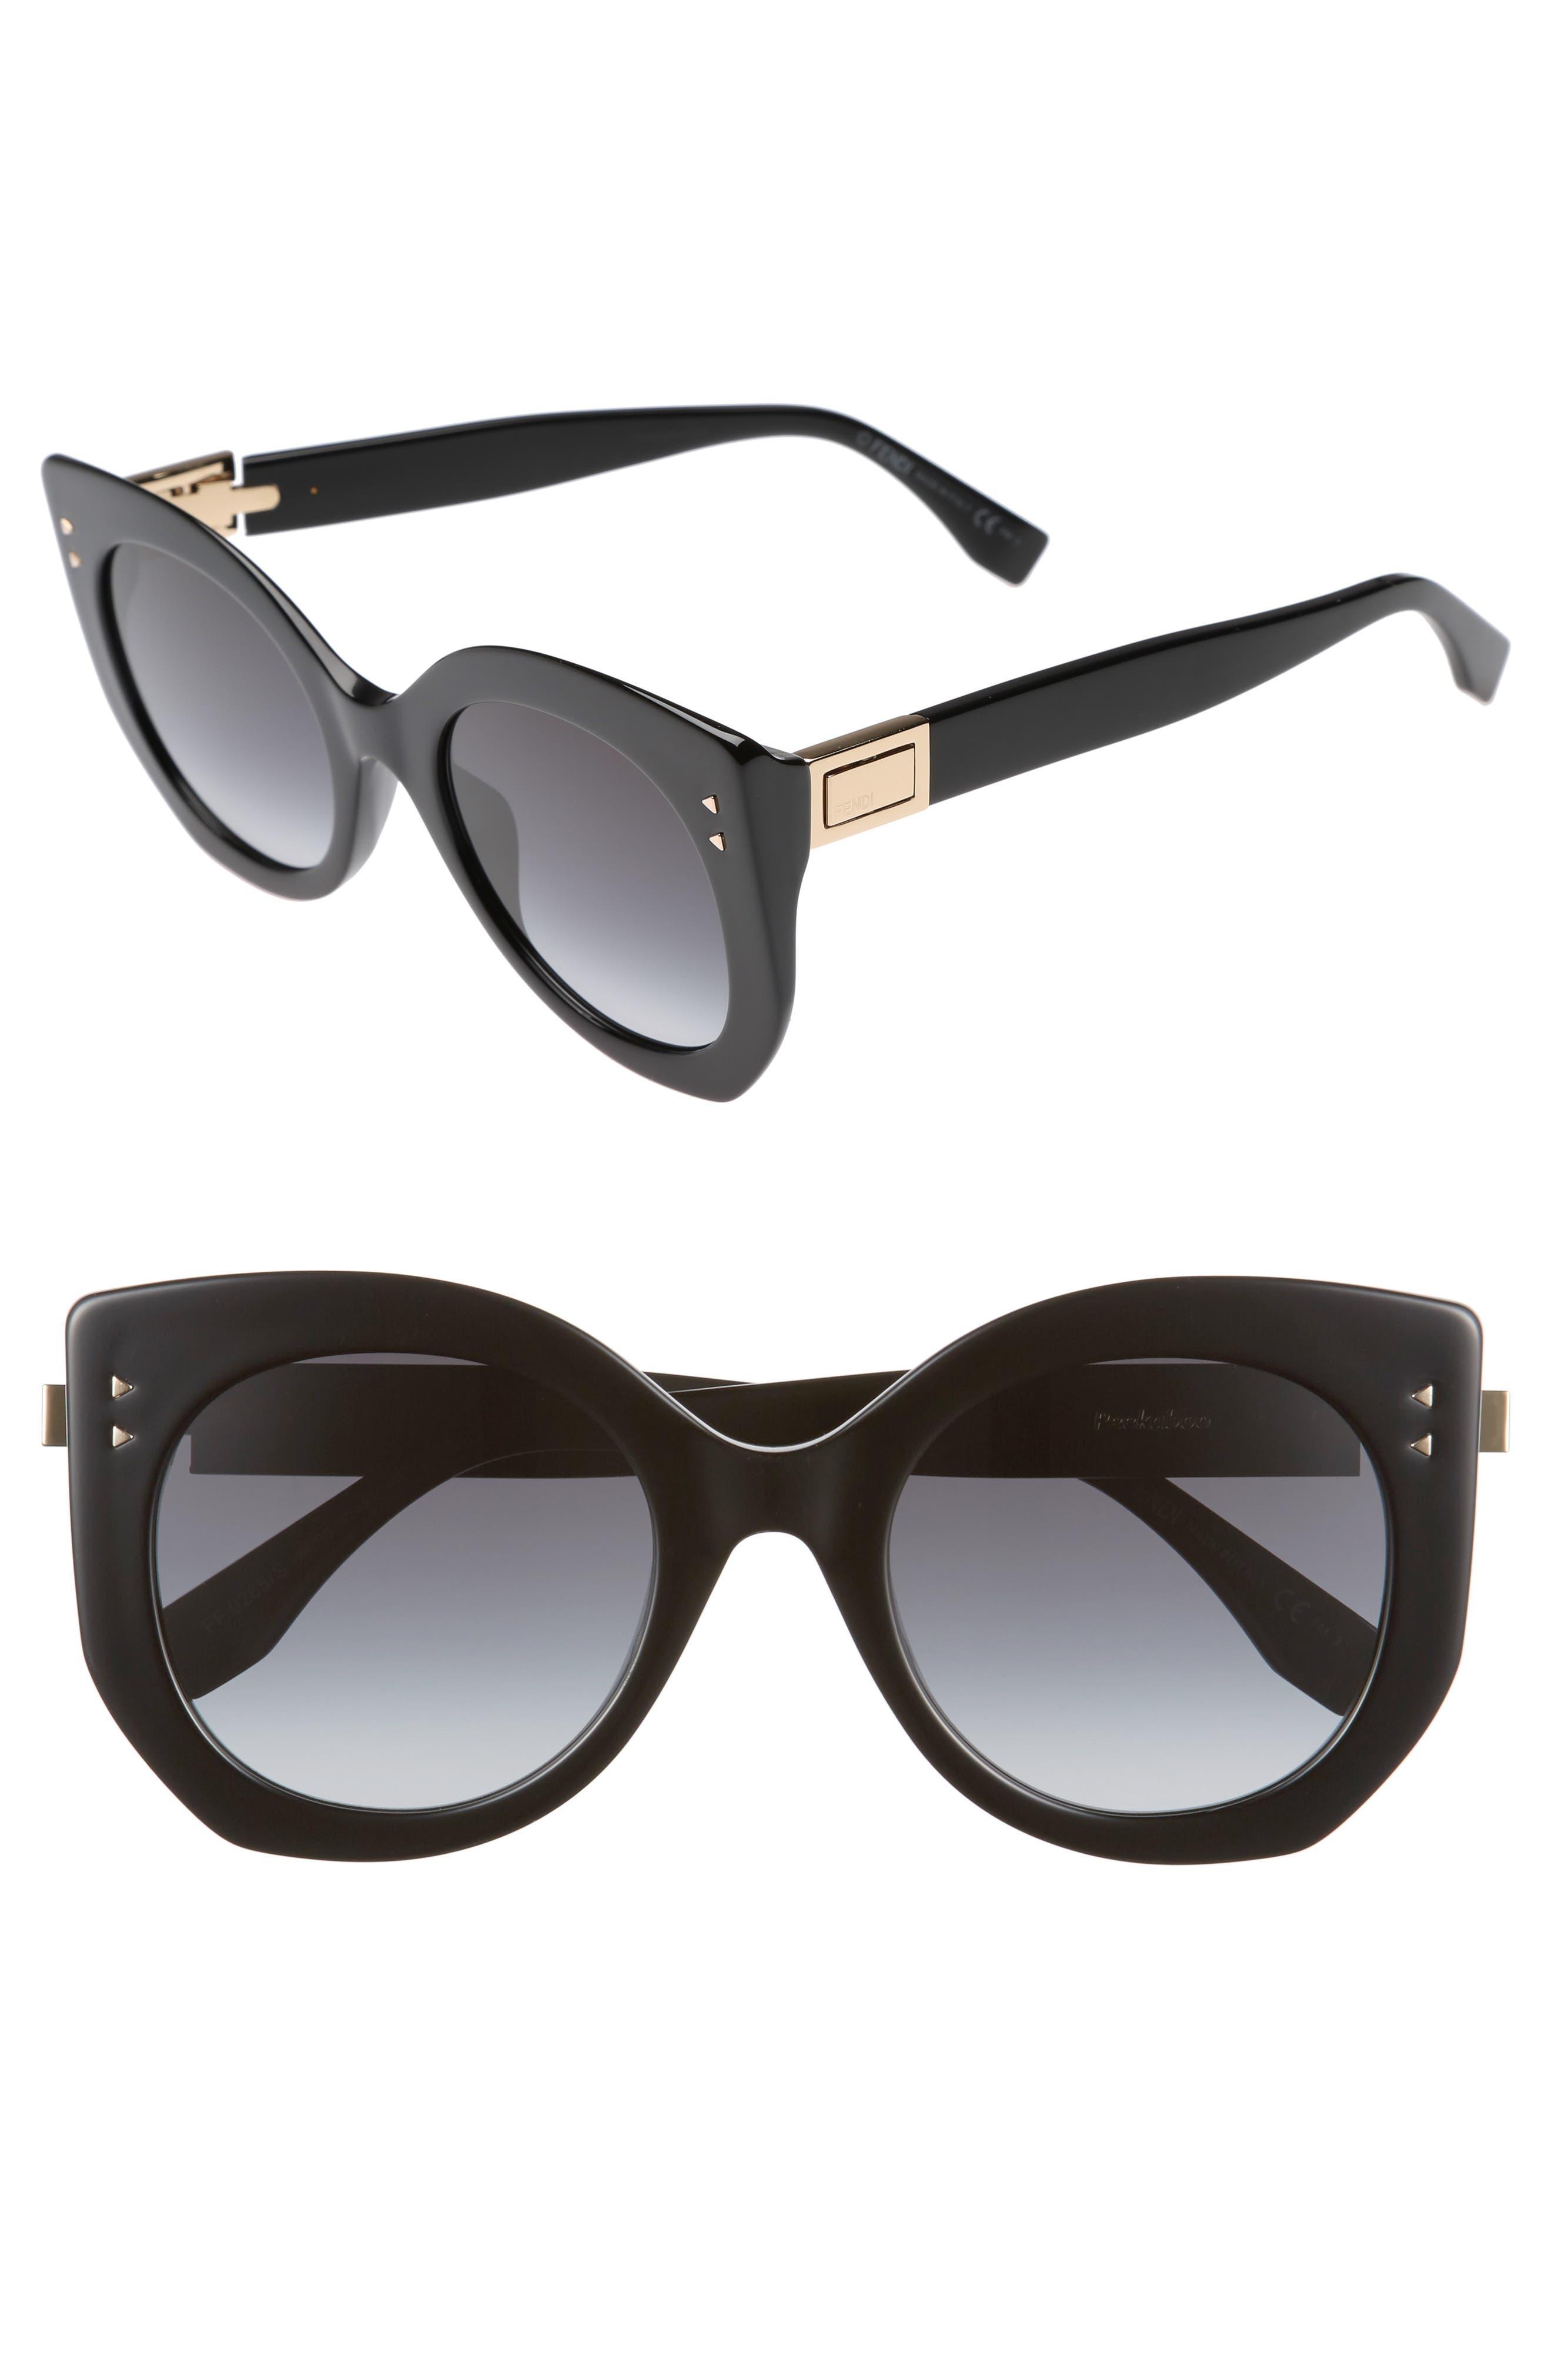 Main Image - Fendi 52mm Butterfly Sunglasses